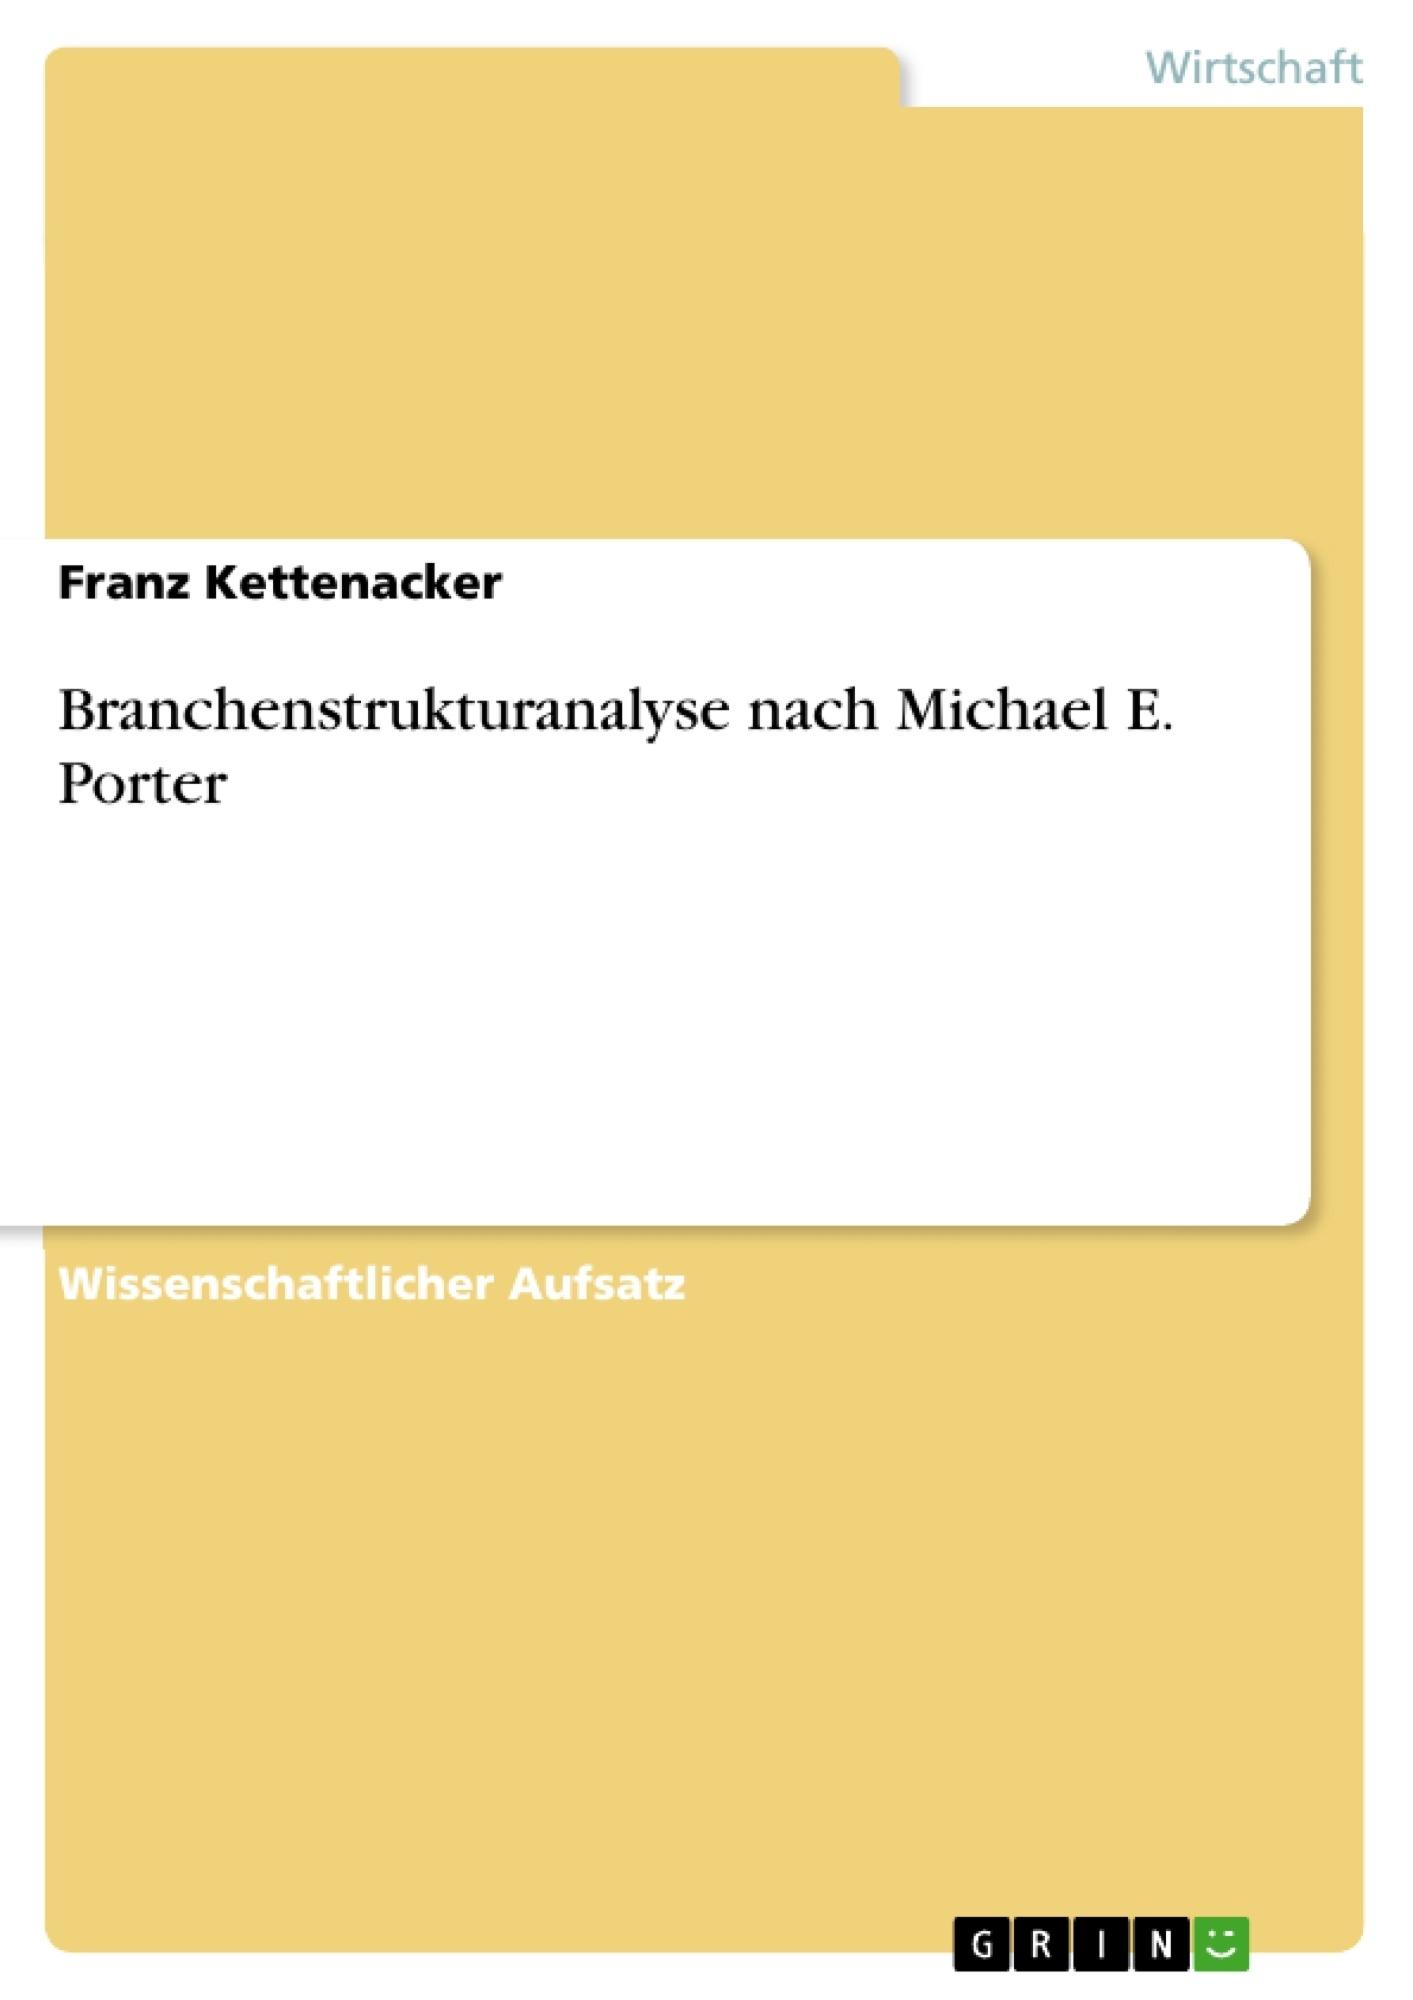 Titel: Branchenstrukturanalyse nach Michael E. Porter